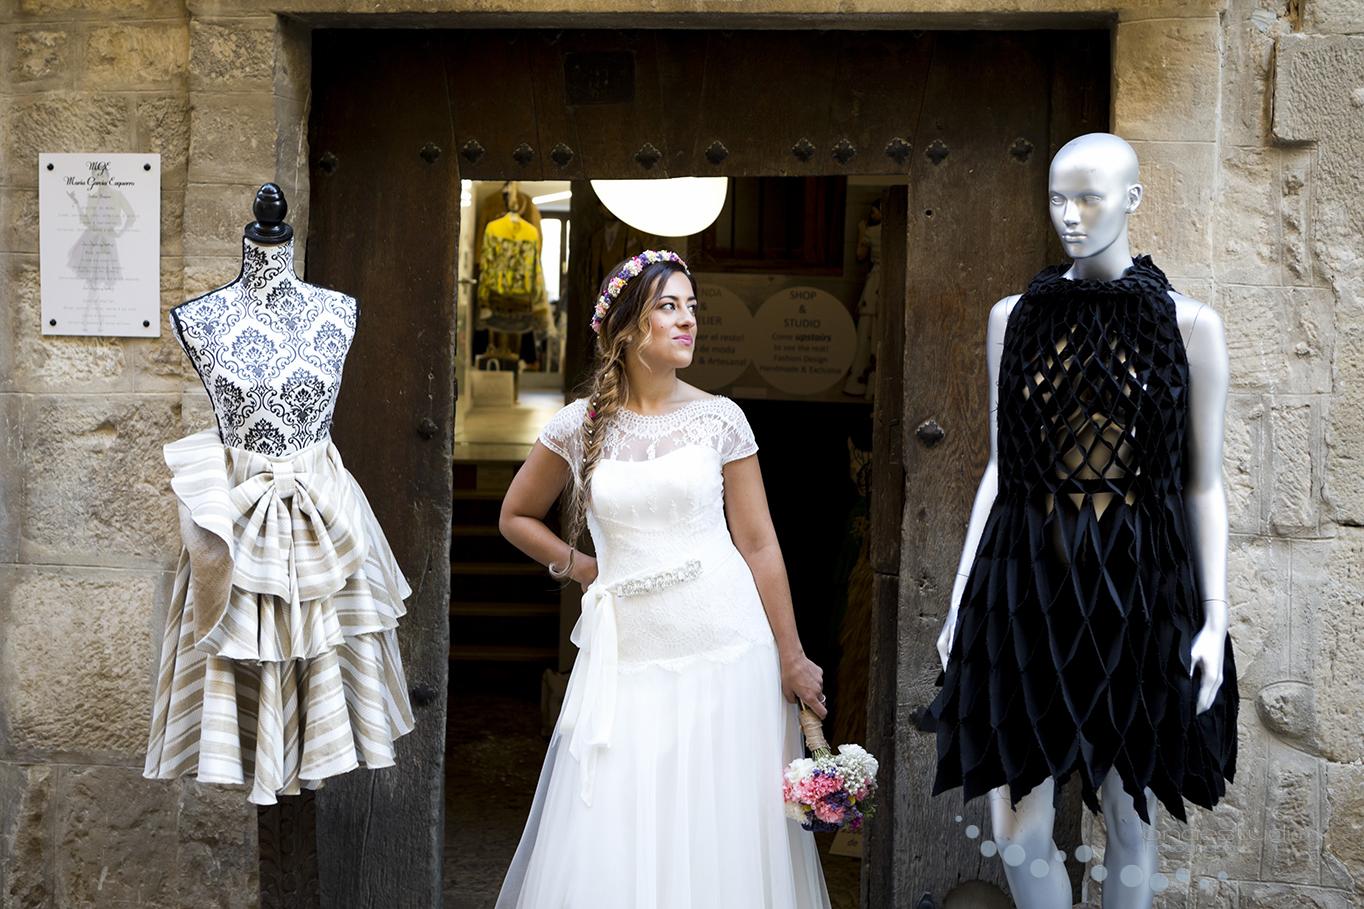 fotos-boda-vitoria-onaestudio_31